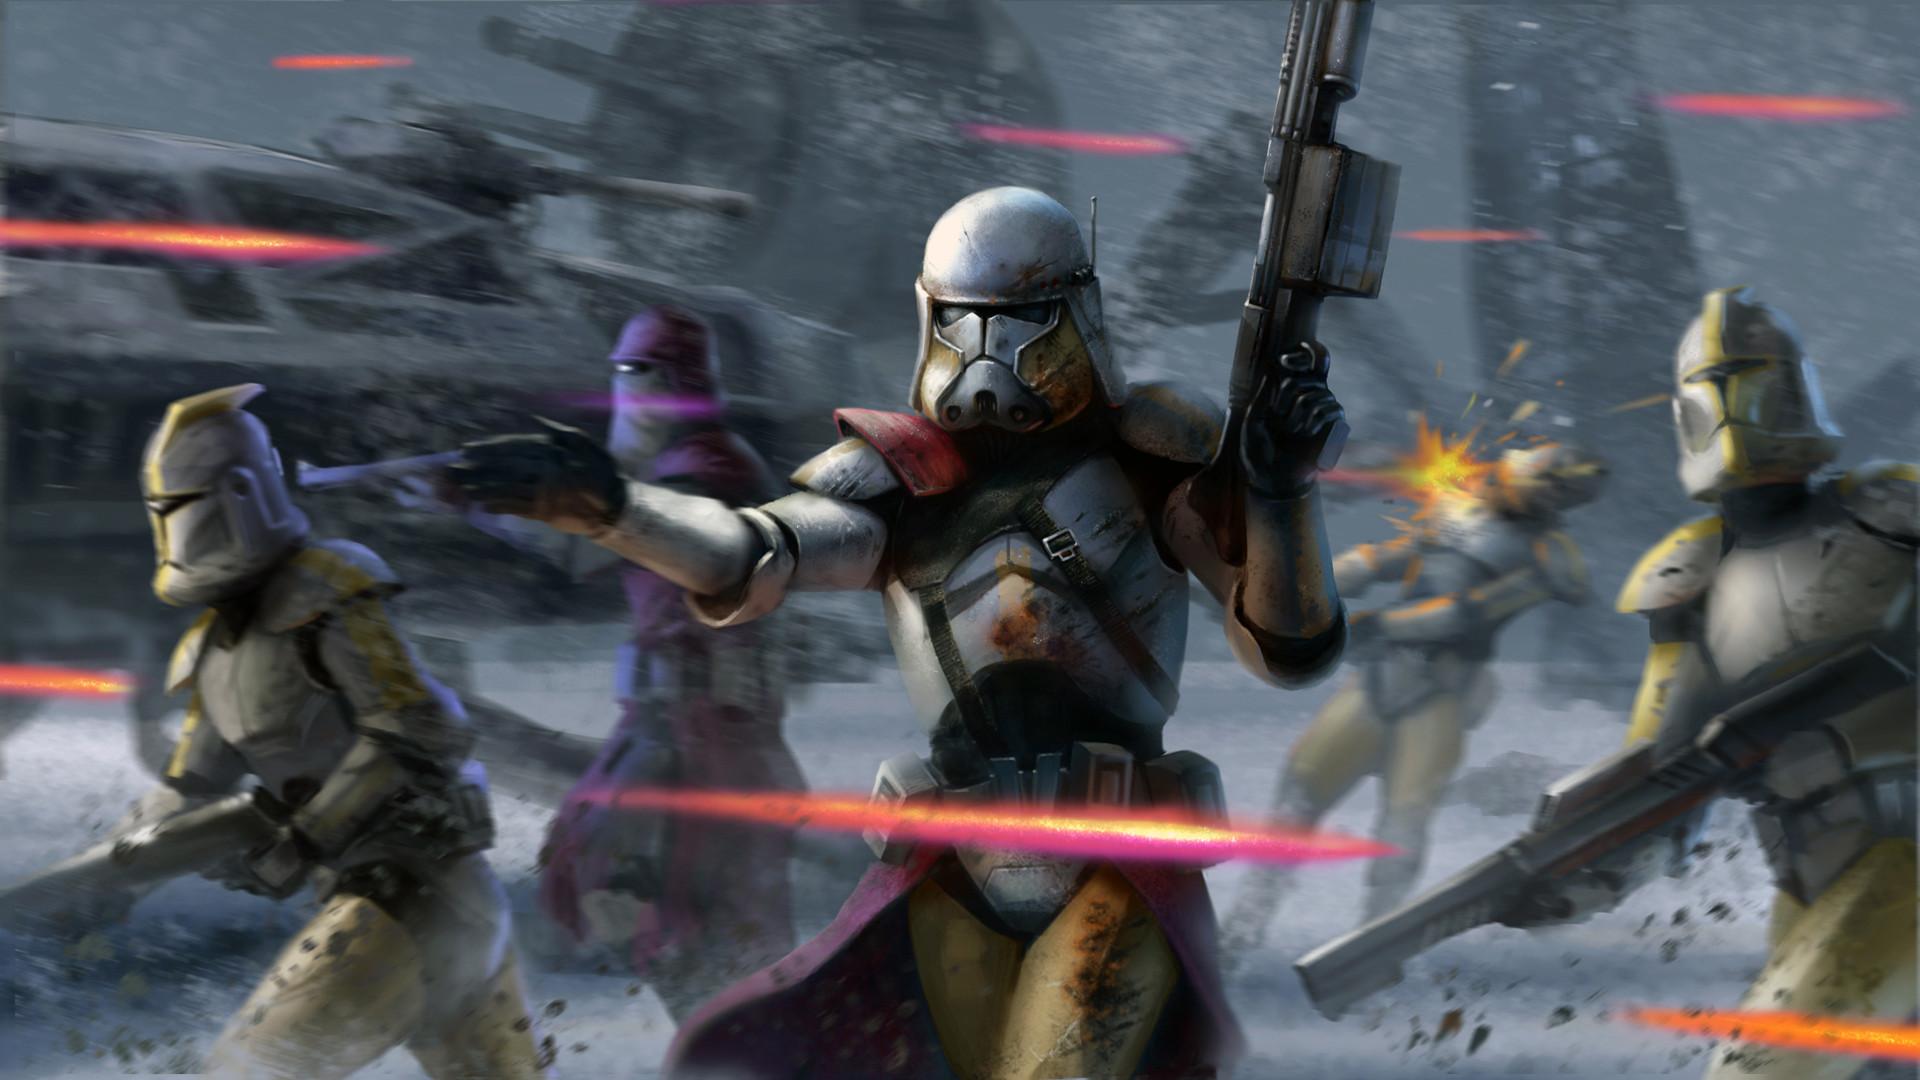 Star Wars The Clone Wars Ahsoka 6814 wallpaper | Desktop Wallpapers |  Pinterest